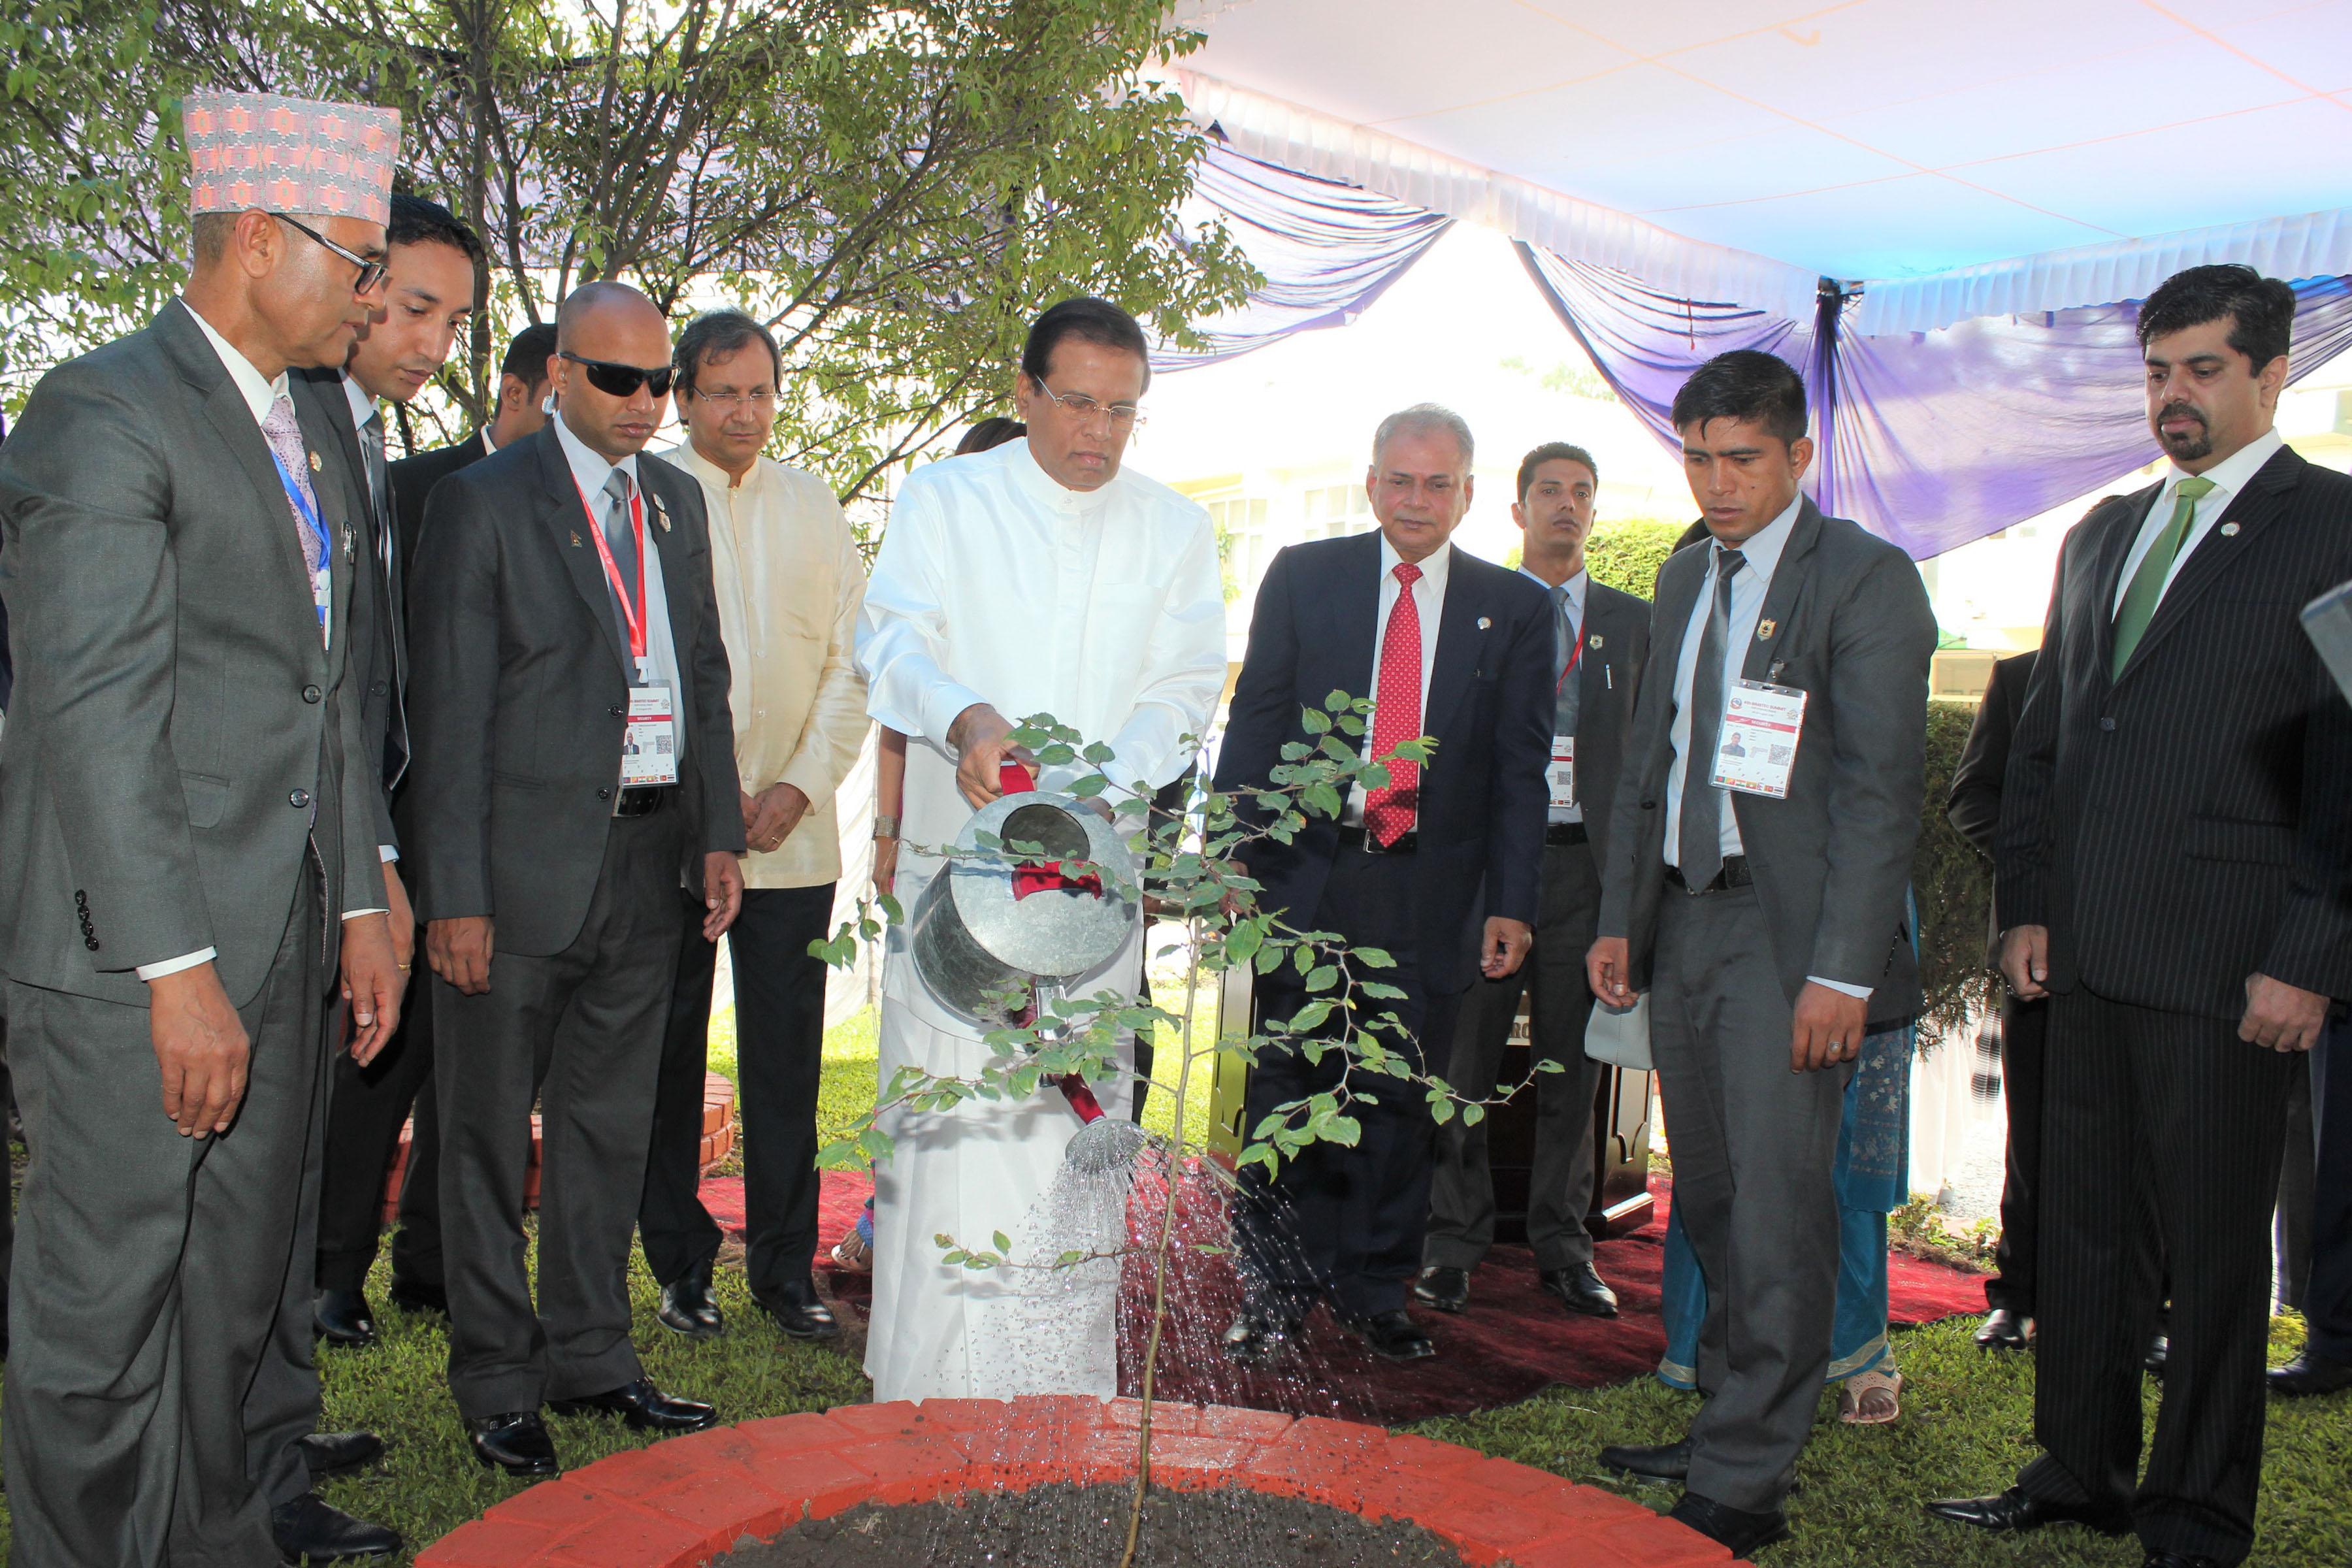 Sri Lanka pledges maximum support to accelerate SAARC process